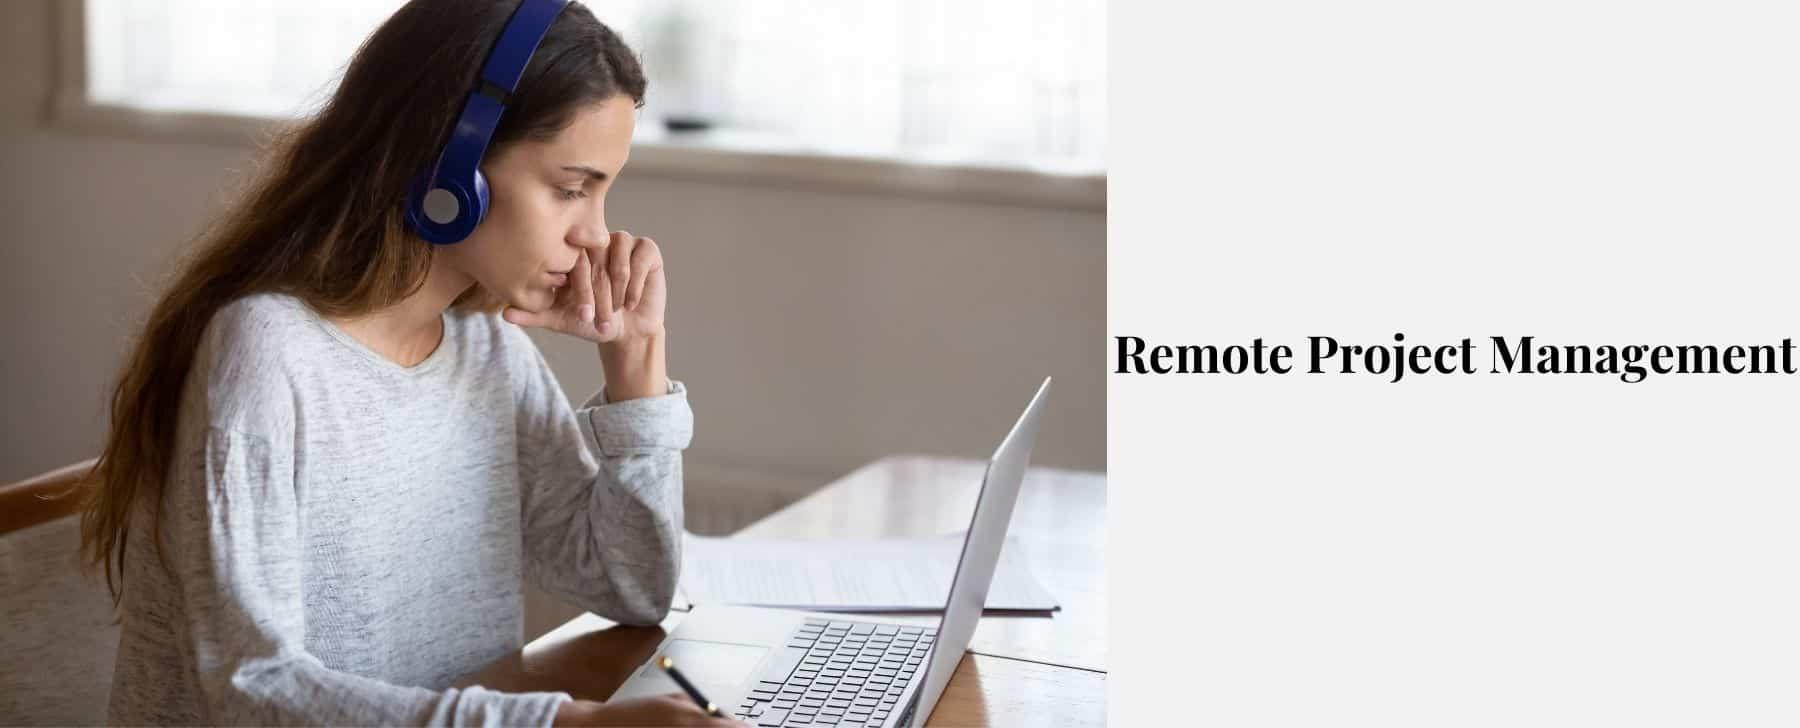 Remote Project Management